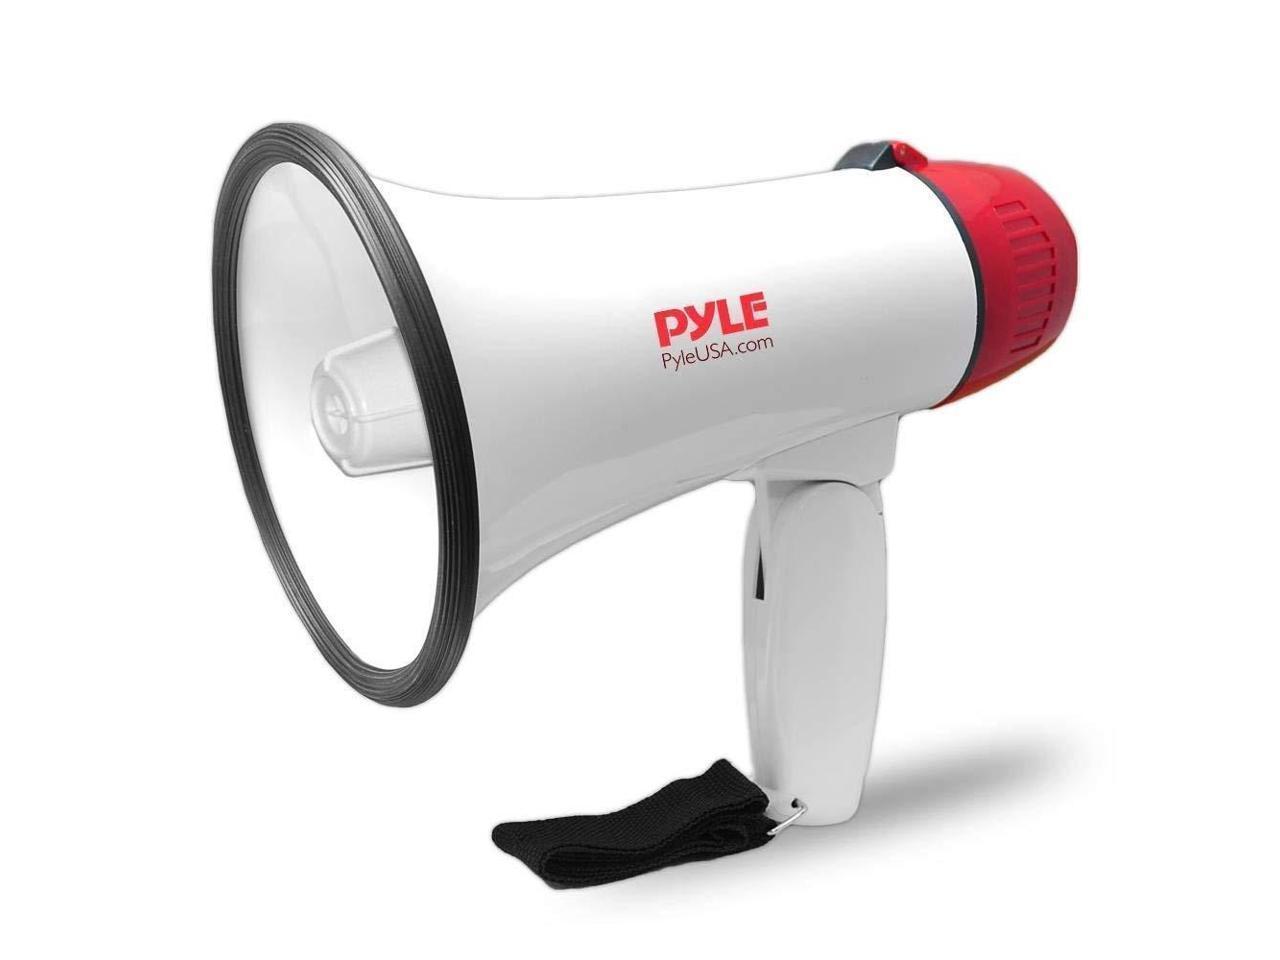 Pyle Megaphone Speaker PA Bullhorn Built-in Siren 40 Watts Adjustable Vol C...